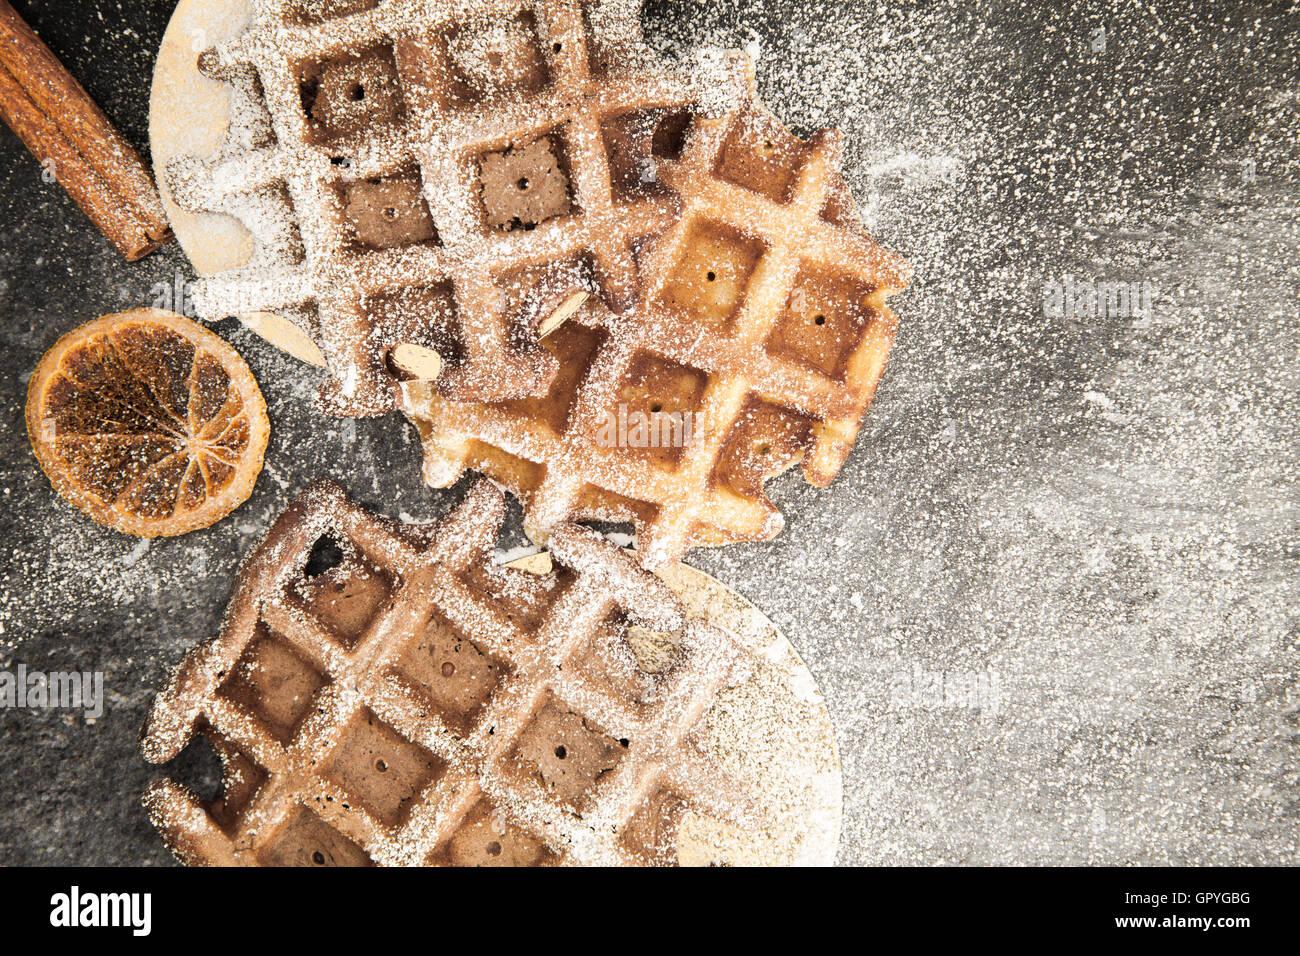 Fondo de alimentos con waffles belgas Imagen De Stock